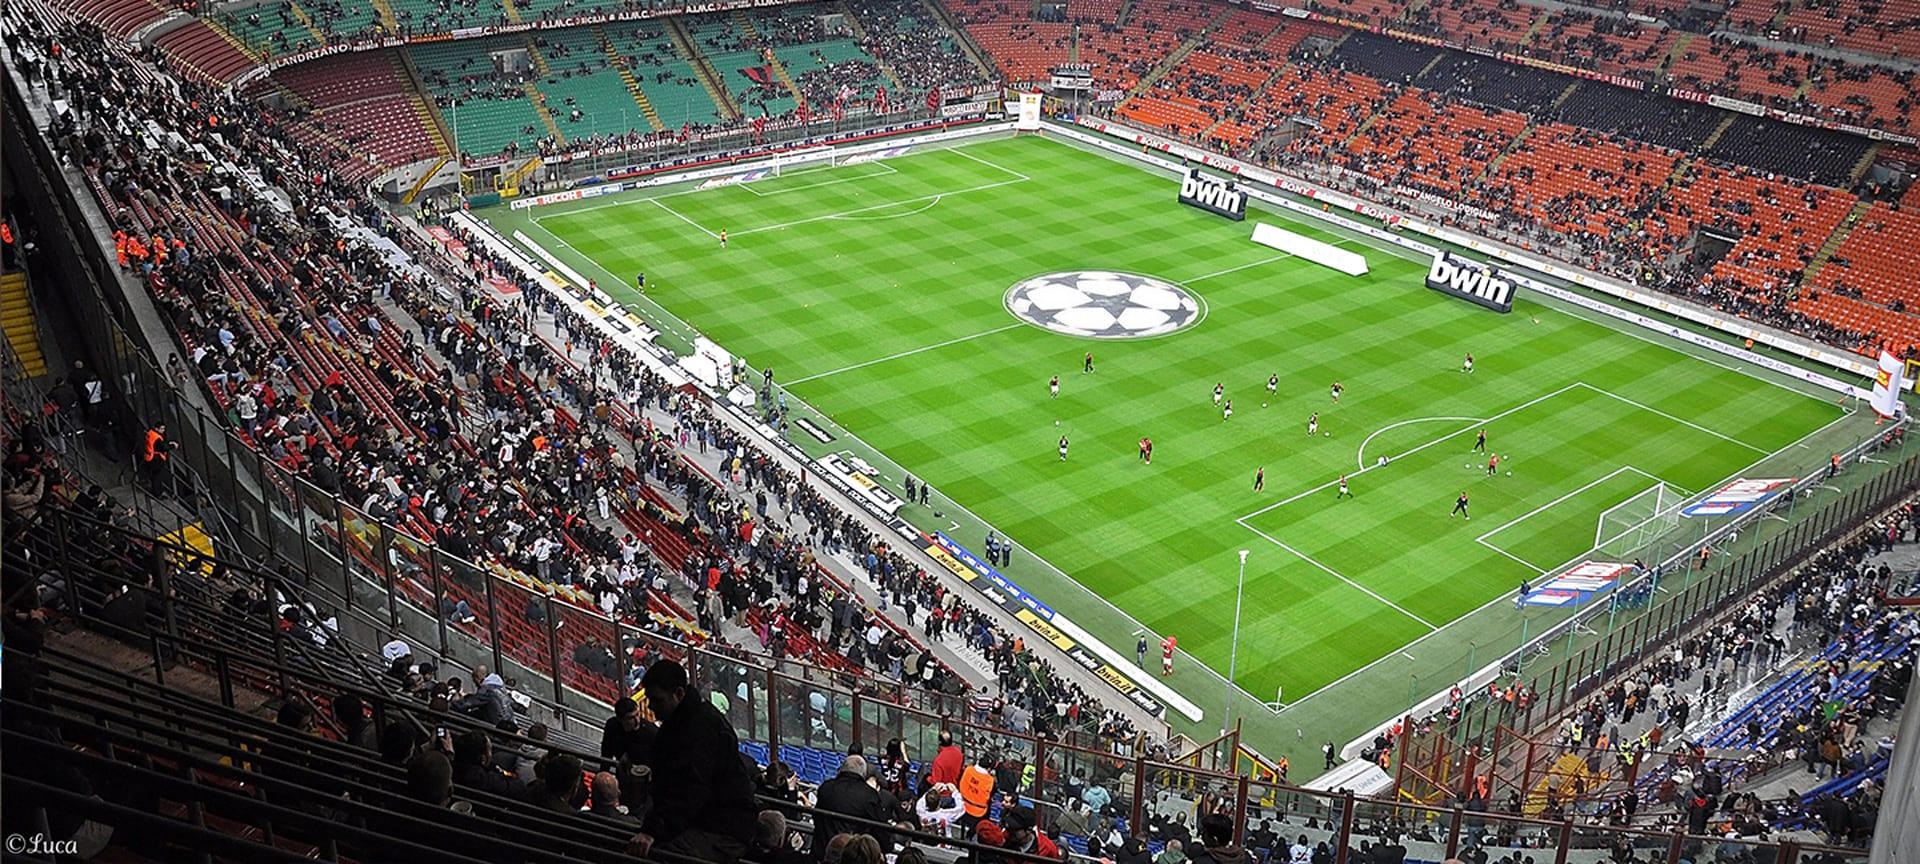 San Sira Soccer Stadium